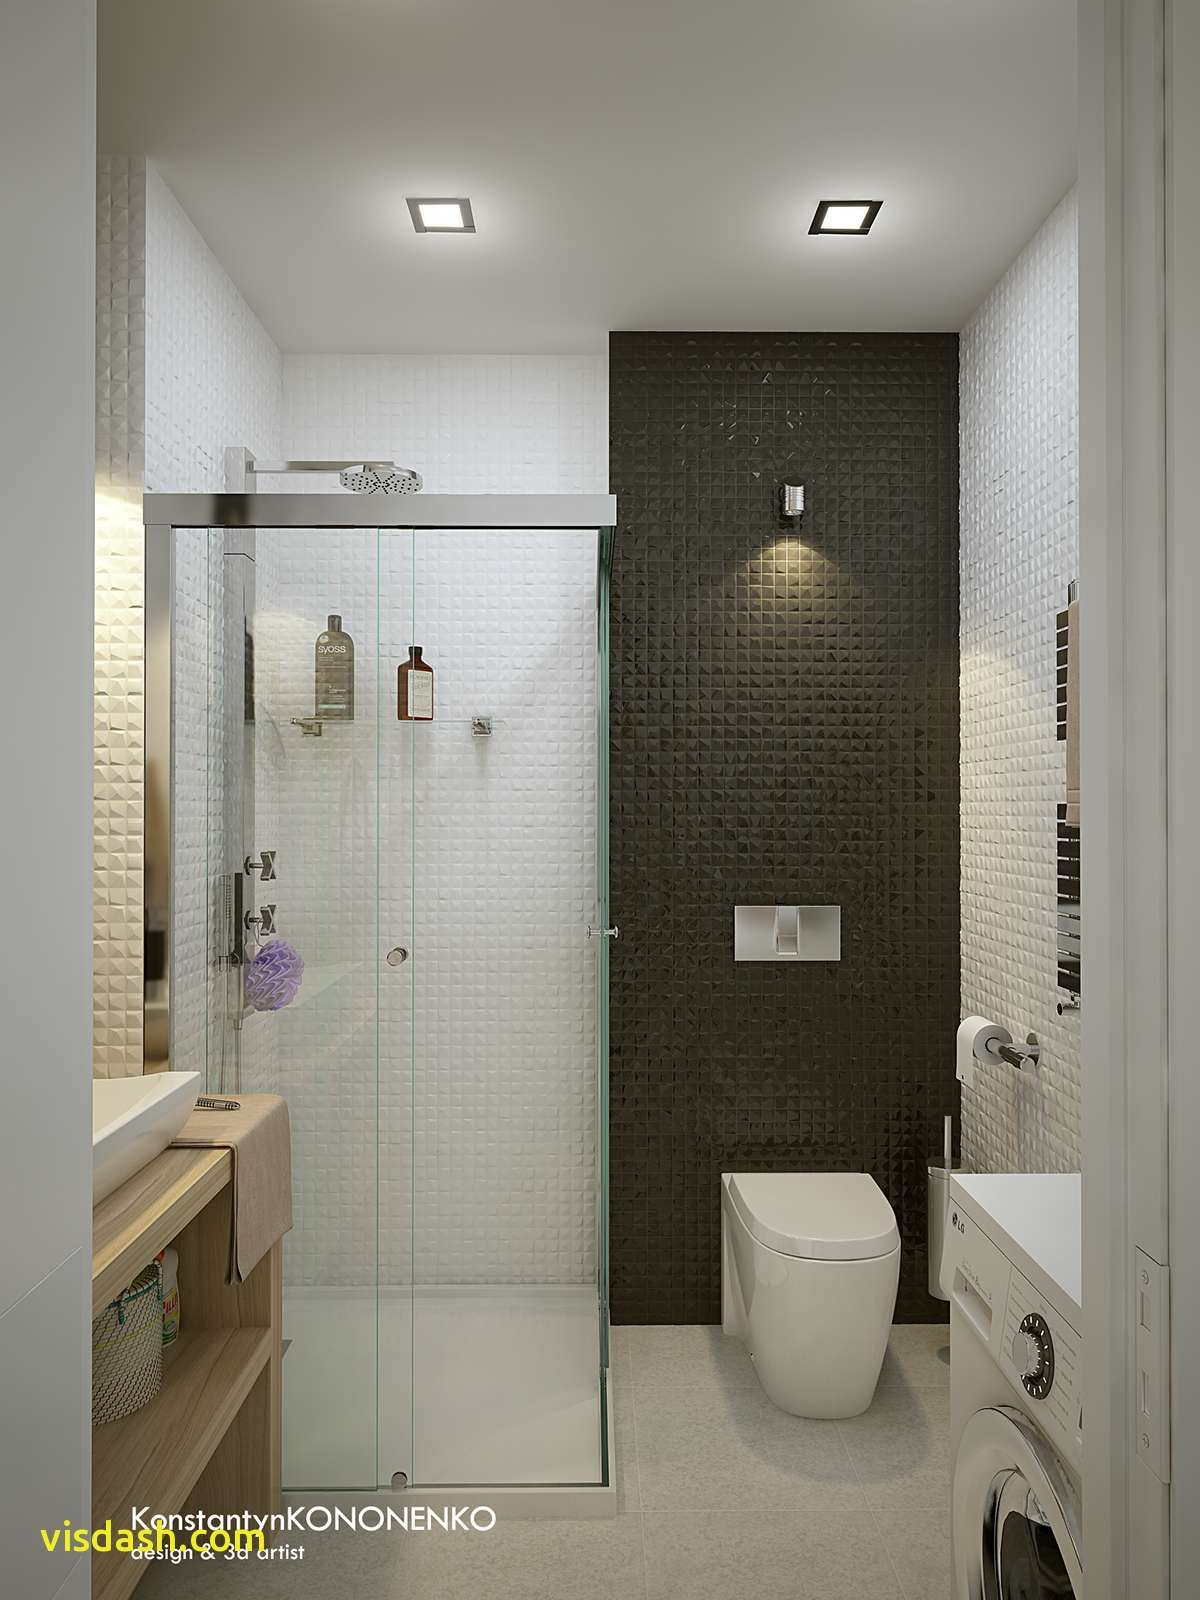 Bathroom Design 2 X 2 Metres Floor Bathtup Shower Ideas Plan Bathroom Design Software Bathroom Design Small Modern Latest Bathroom Designs